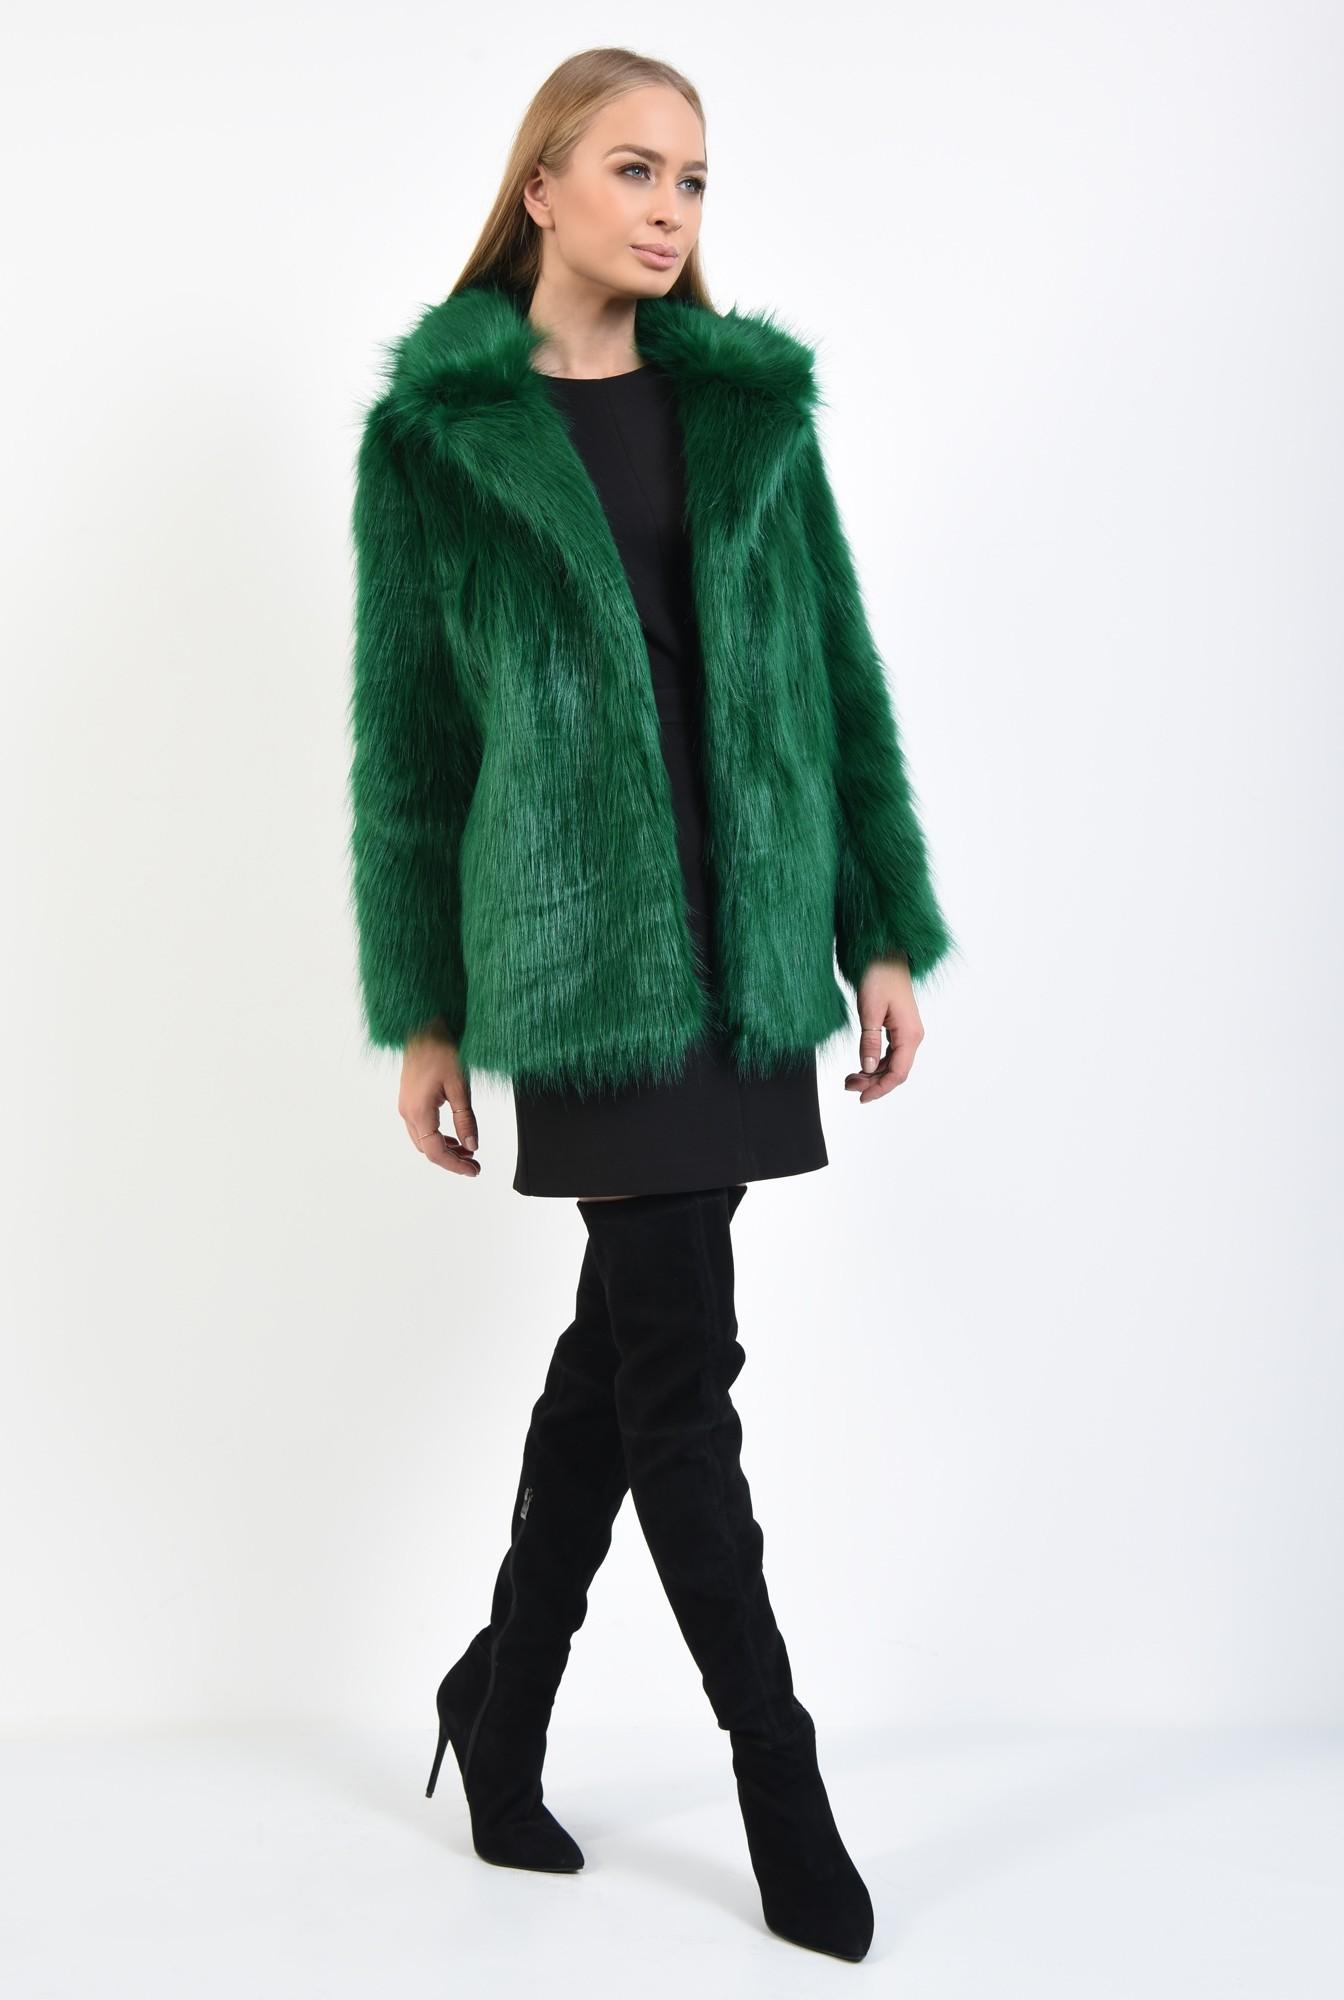 3 - haina din blana ecologica, dreapta, guler cu revere, verde